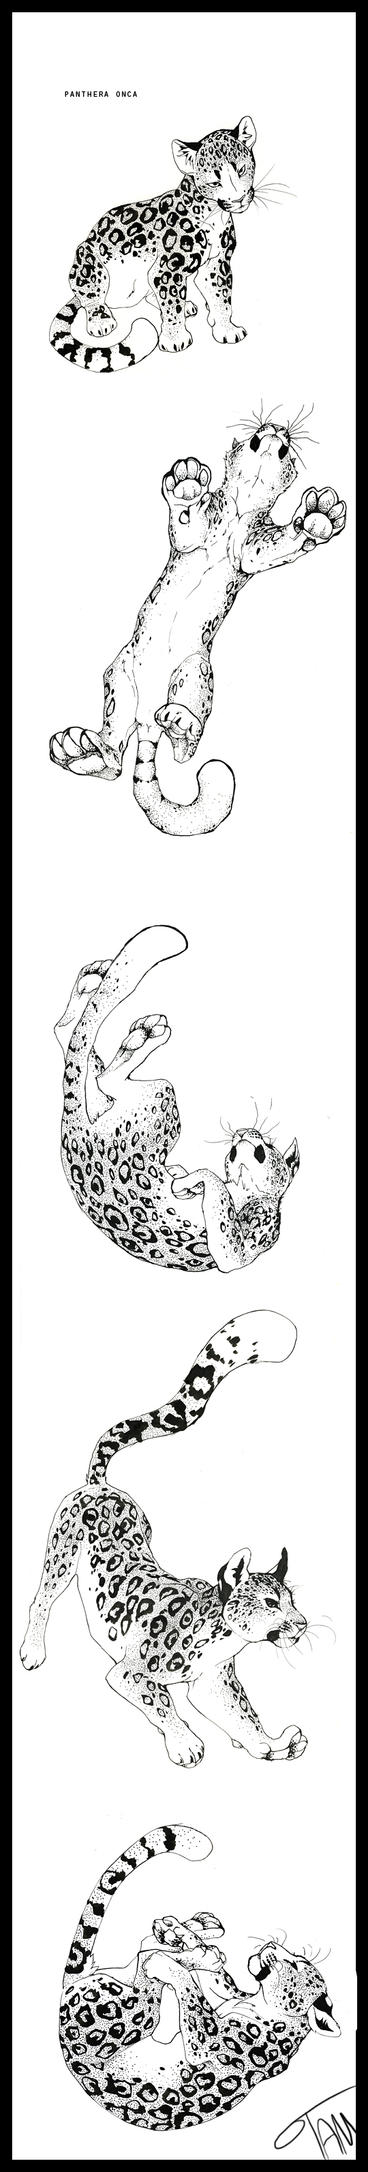 Panthera Onca by TamberElla